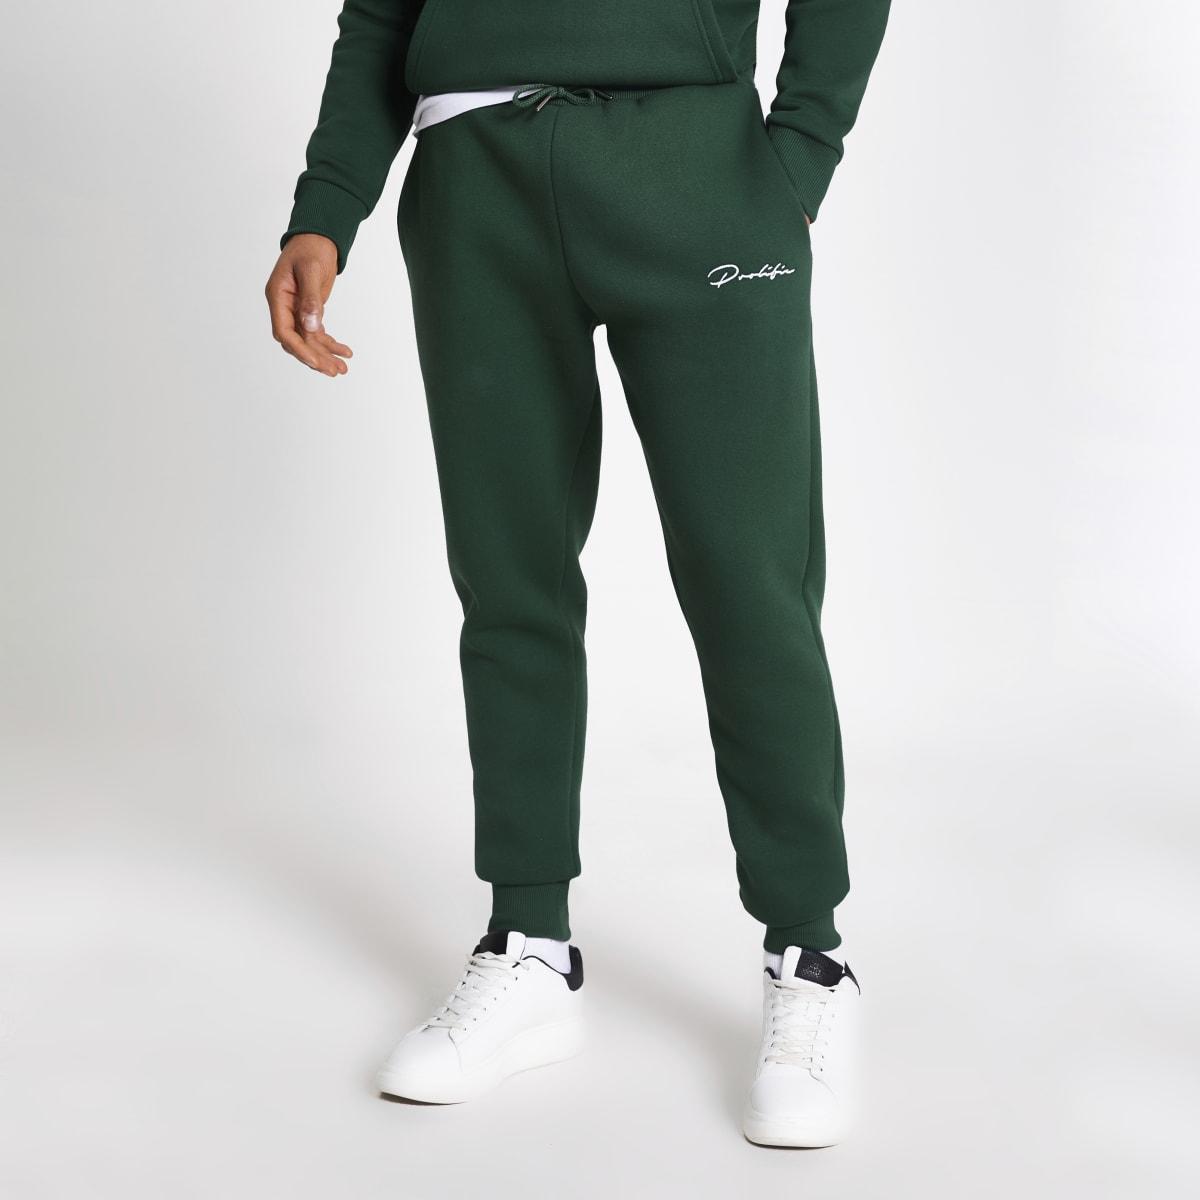 Prolific – Pantalons de jogging slim vert foncé